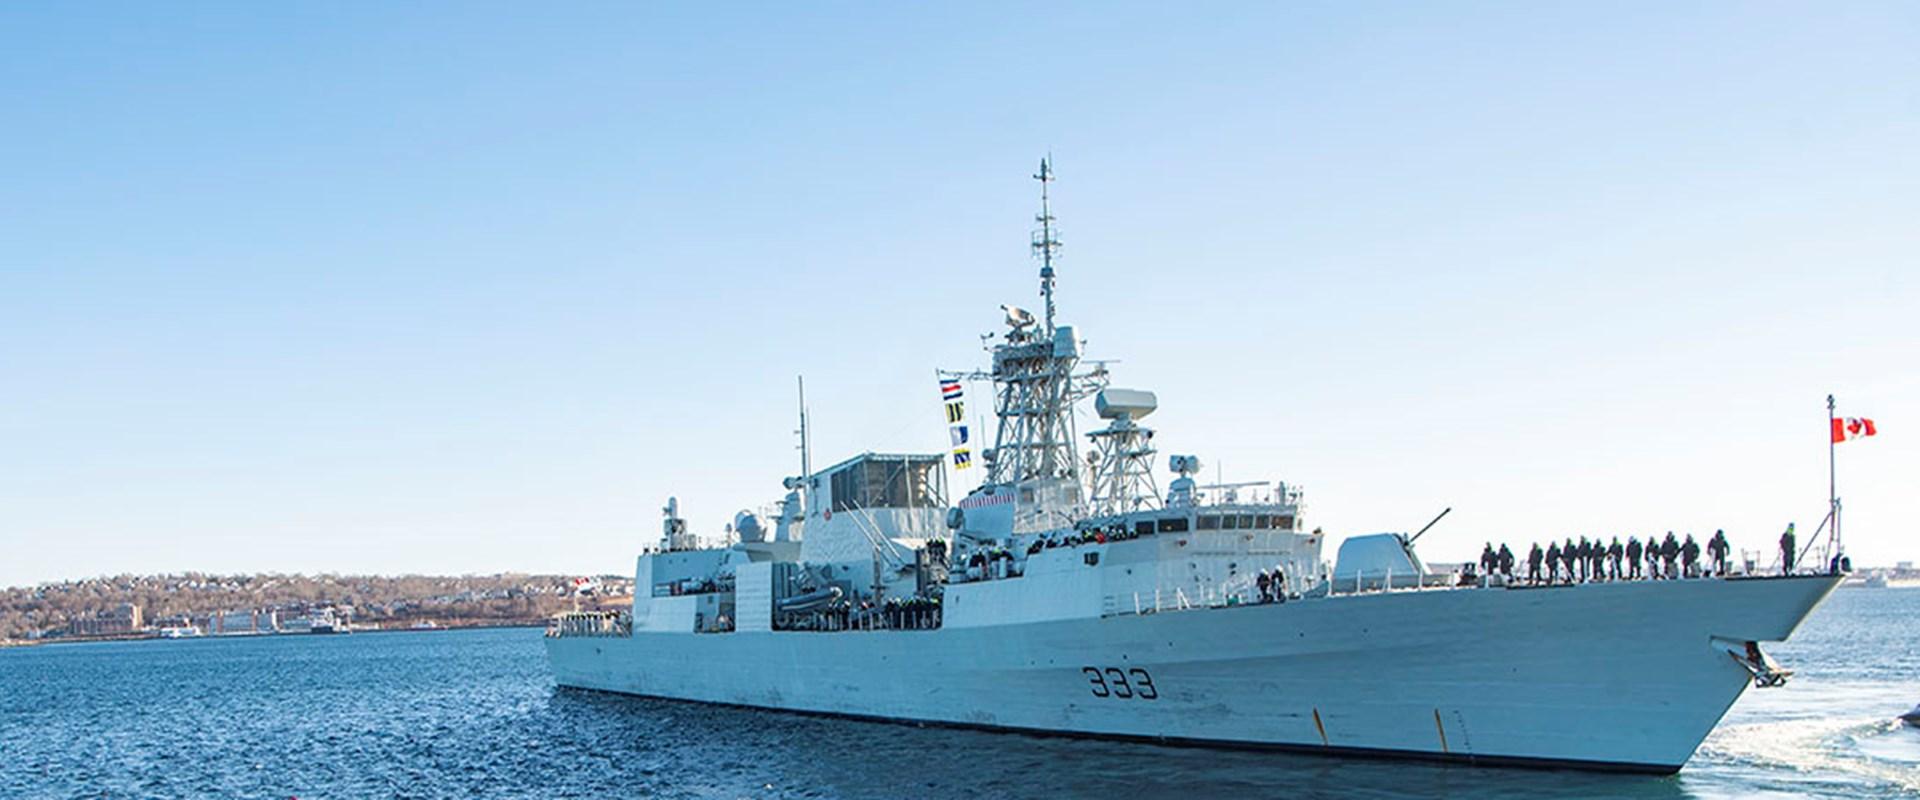 ELMS2 Royal Canadian Navy - banner